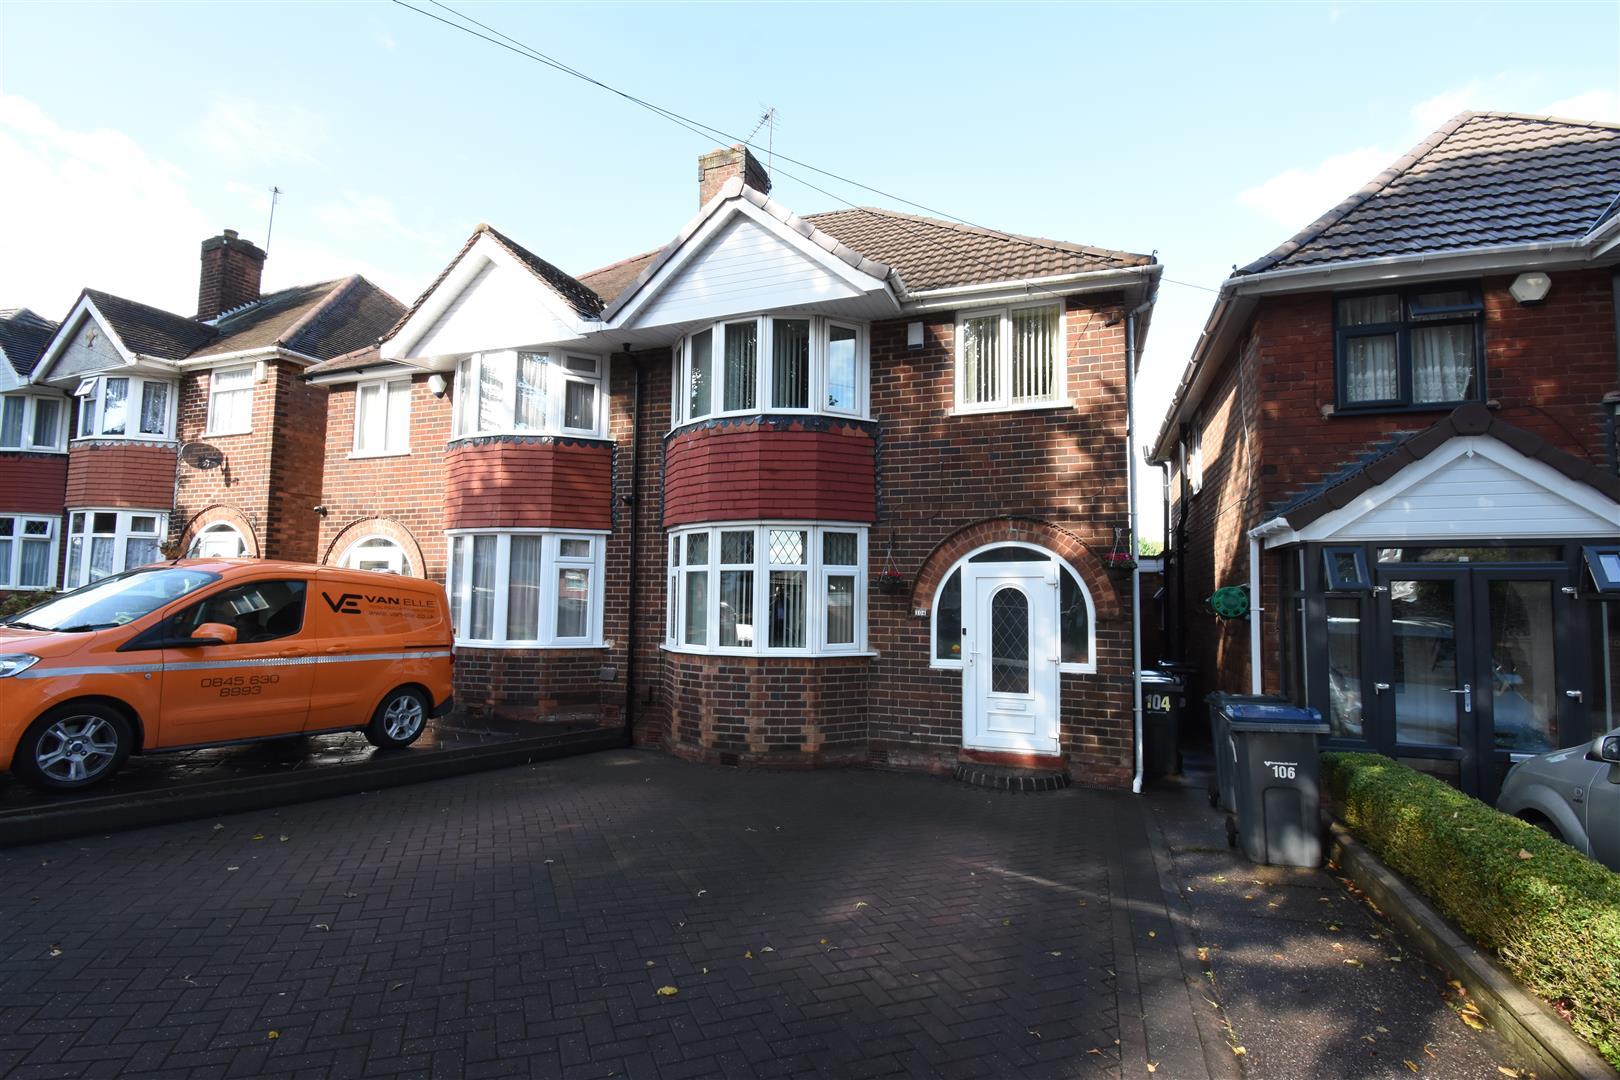 3 bed house for sale in Beaufort Avenue, Birmingham, B34